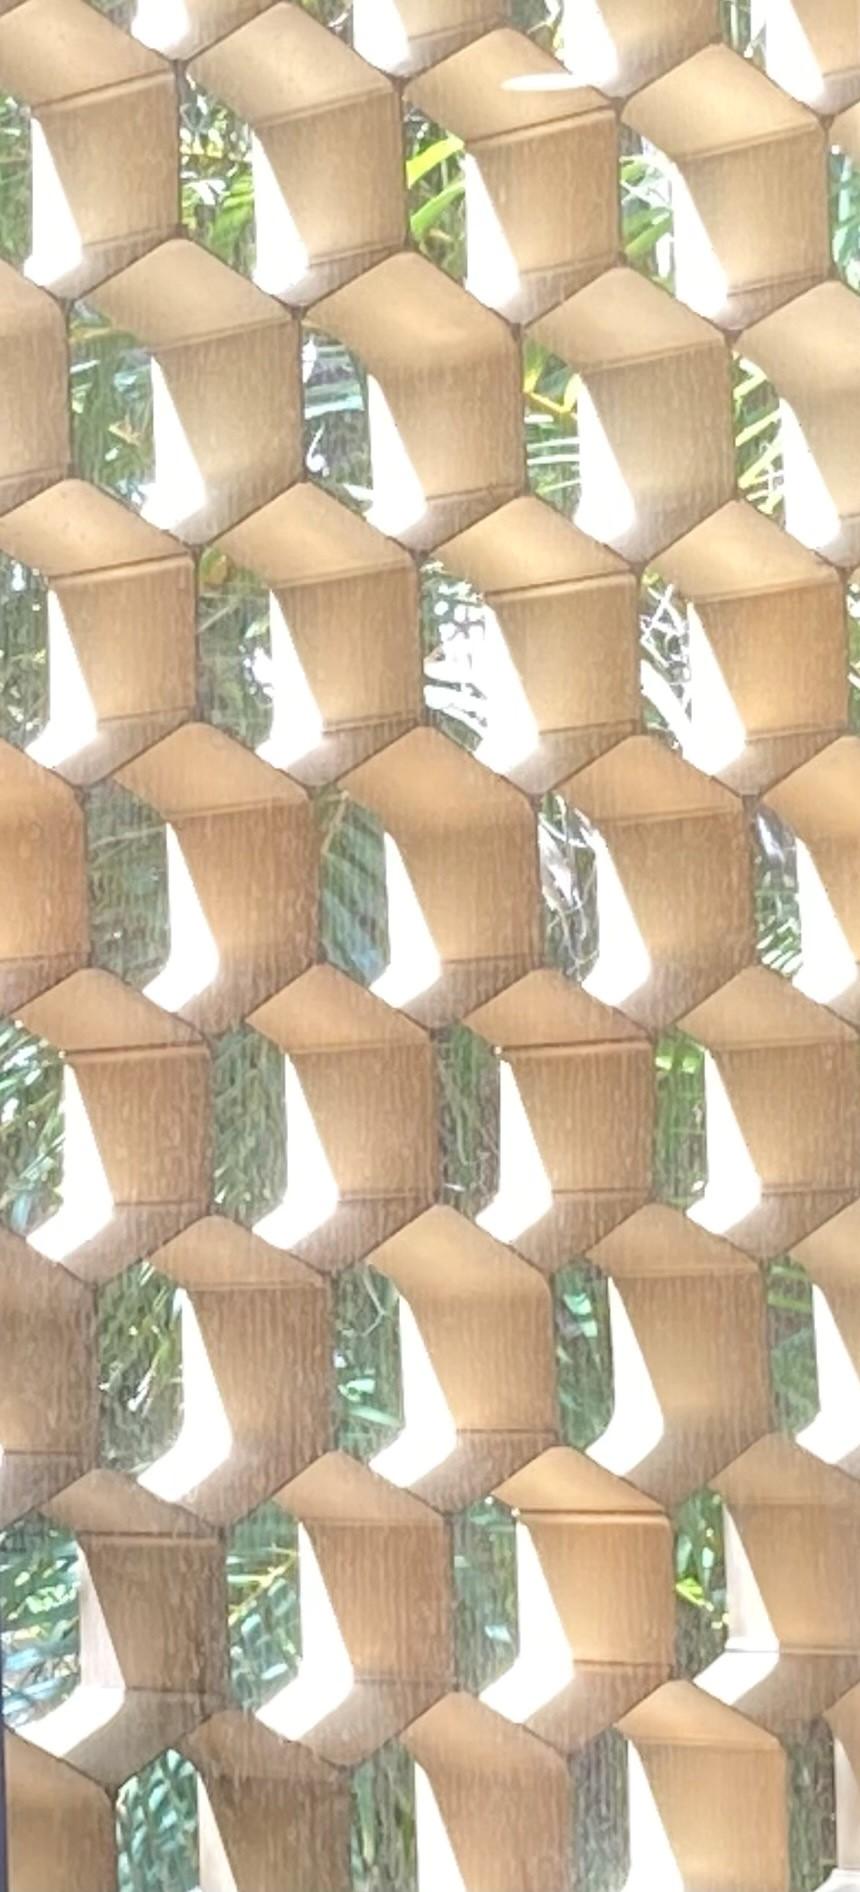 Honeycomb baffles on windows